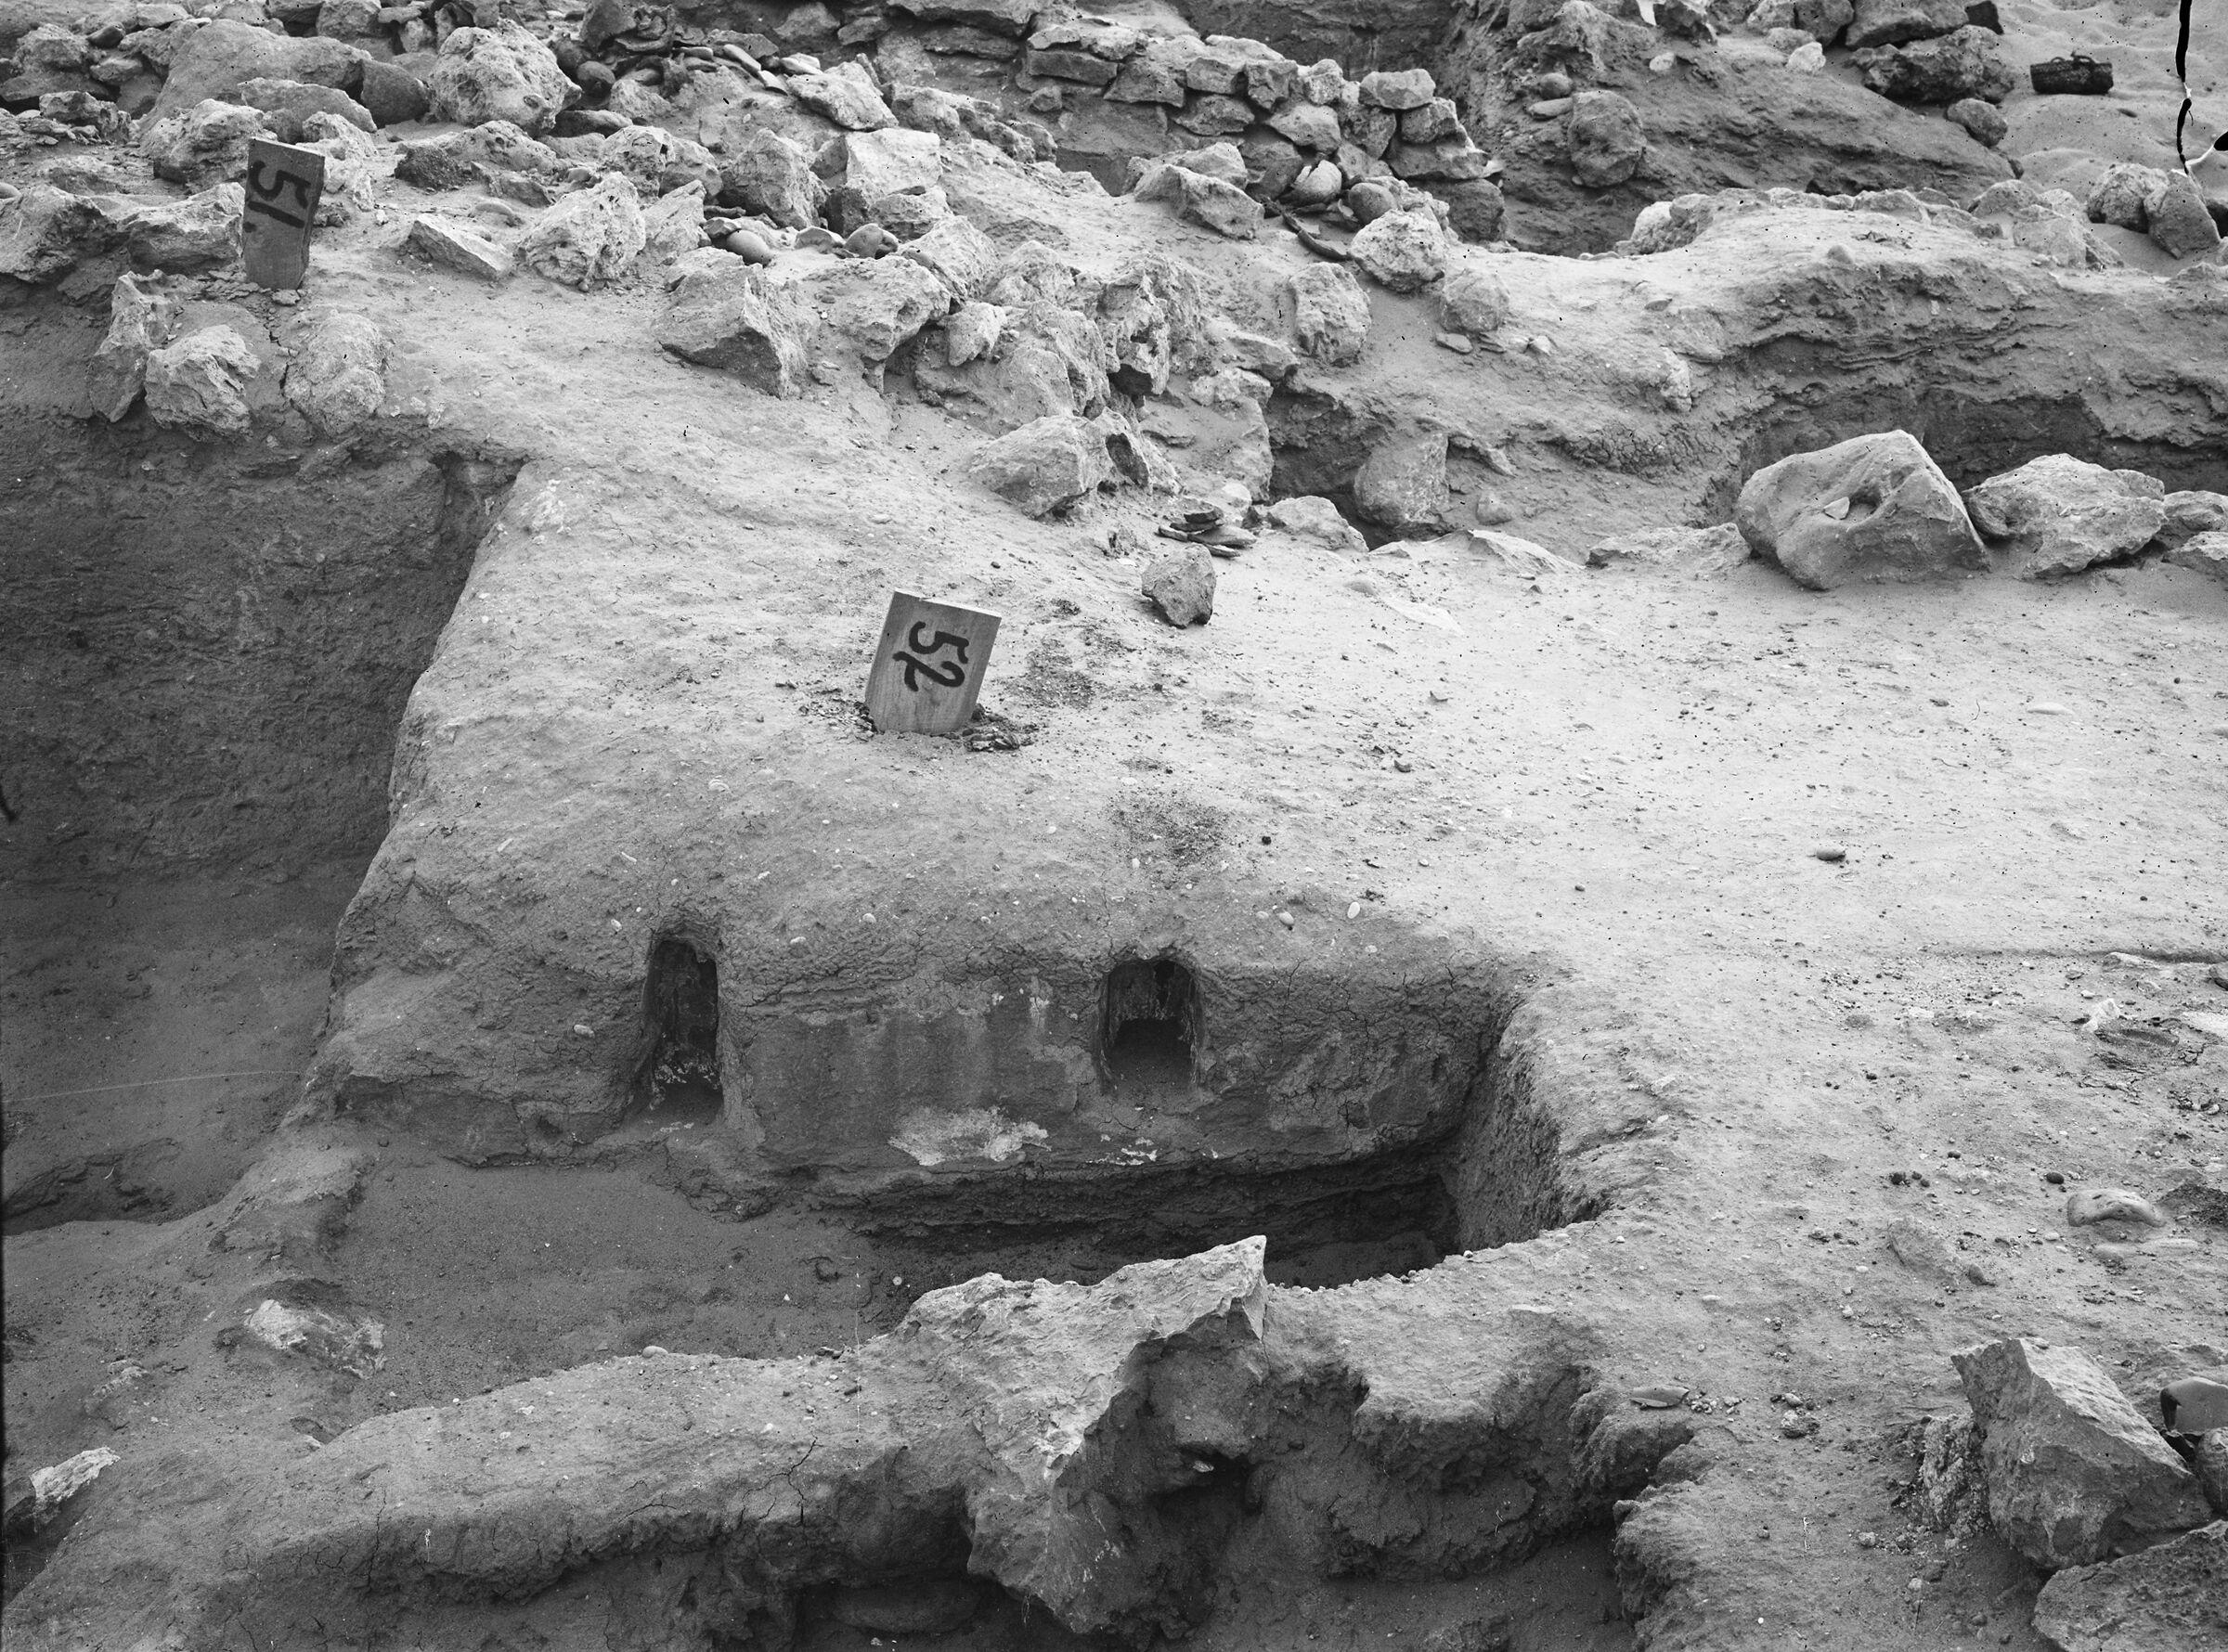 Wadi Cemetery (Reisner; north of W. Cem): Site: Giza; View: GW 51, GW 52